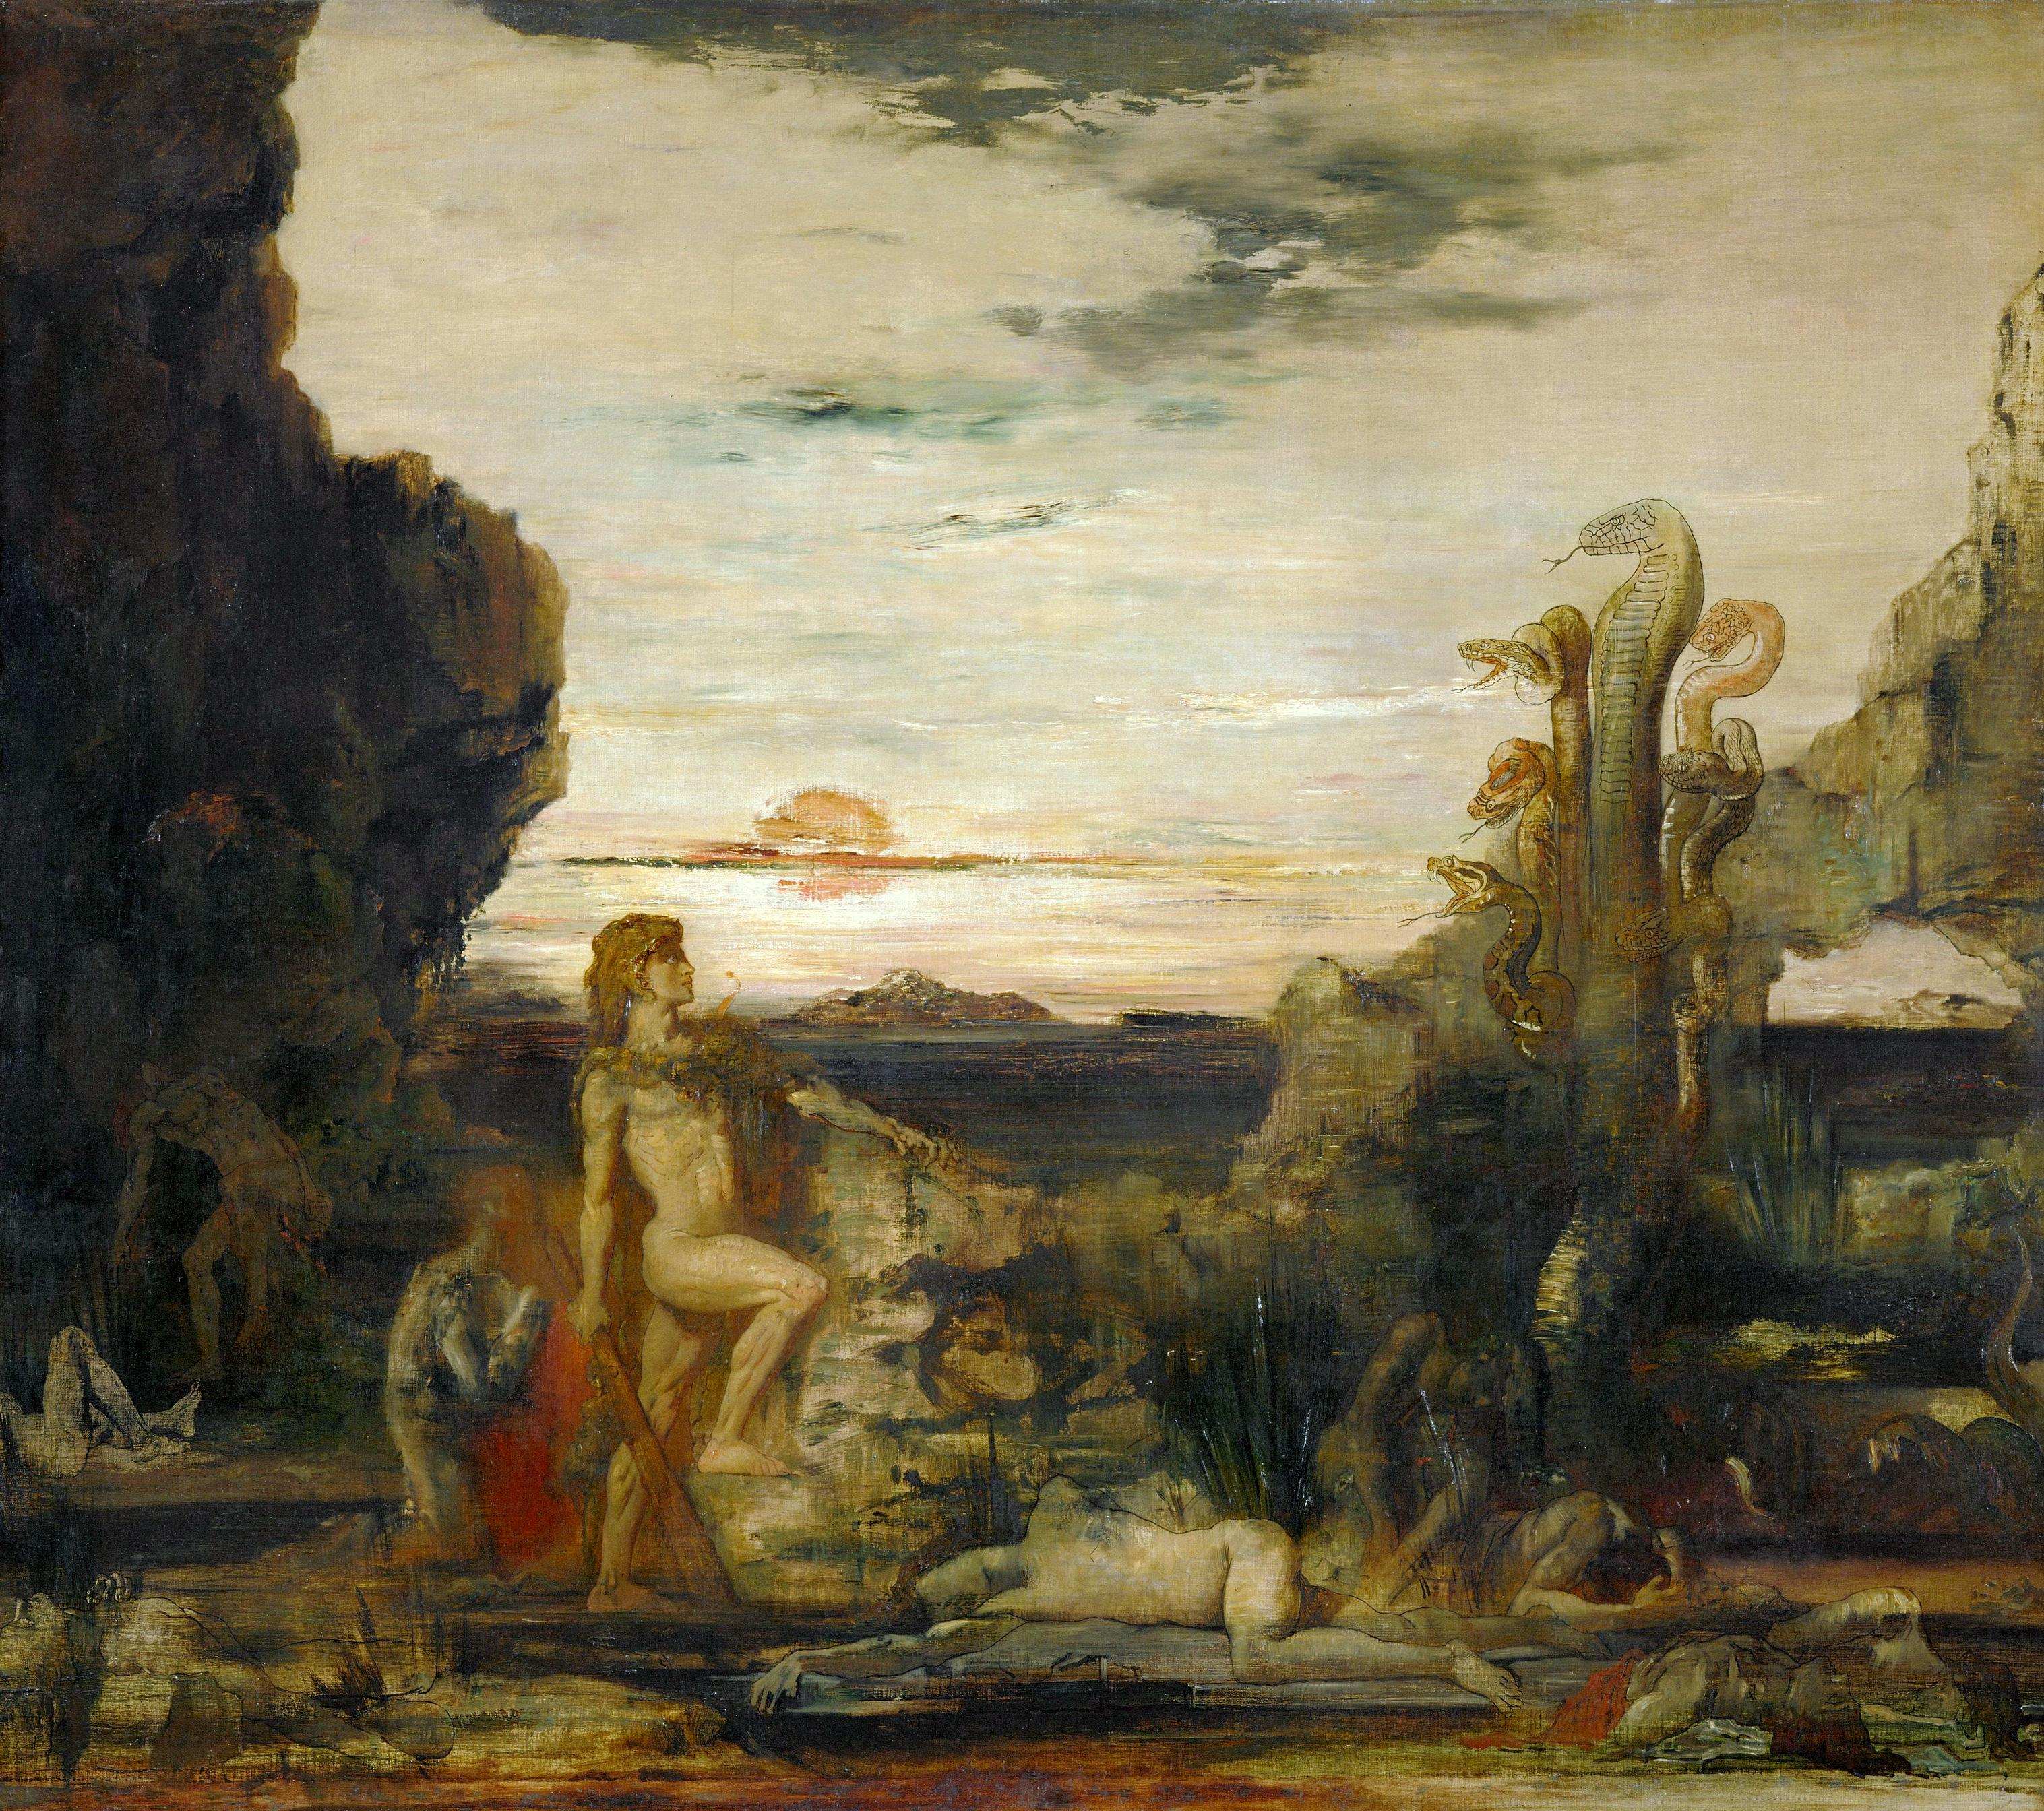 1875_Геркулес и лернейская гидра (142 х 168 см) (Париж, музей Гюстава Моро)